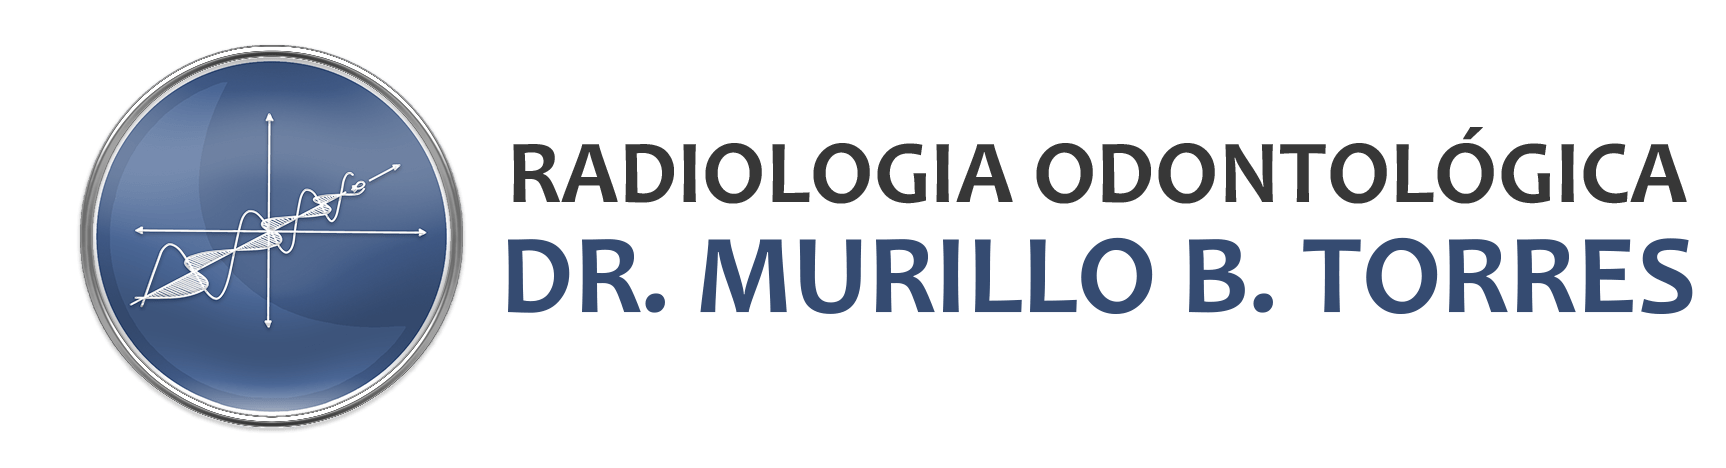 Radiologia Odontológica Dr. Murillo Torres RJ